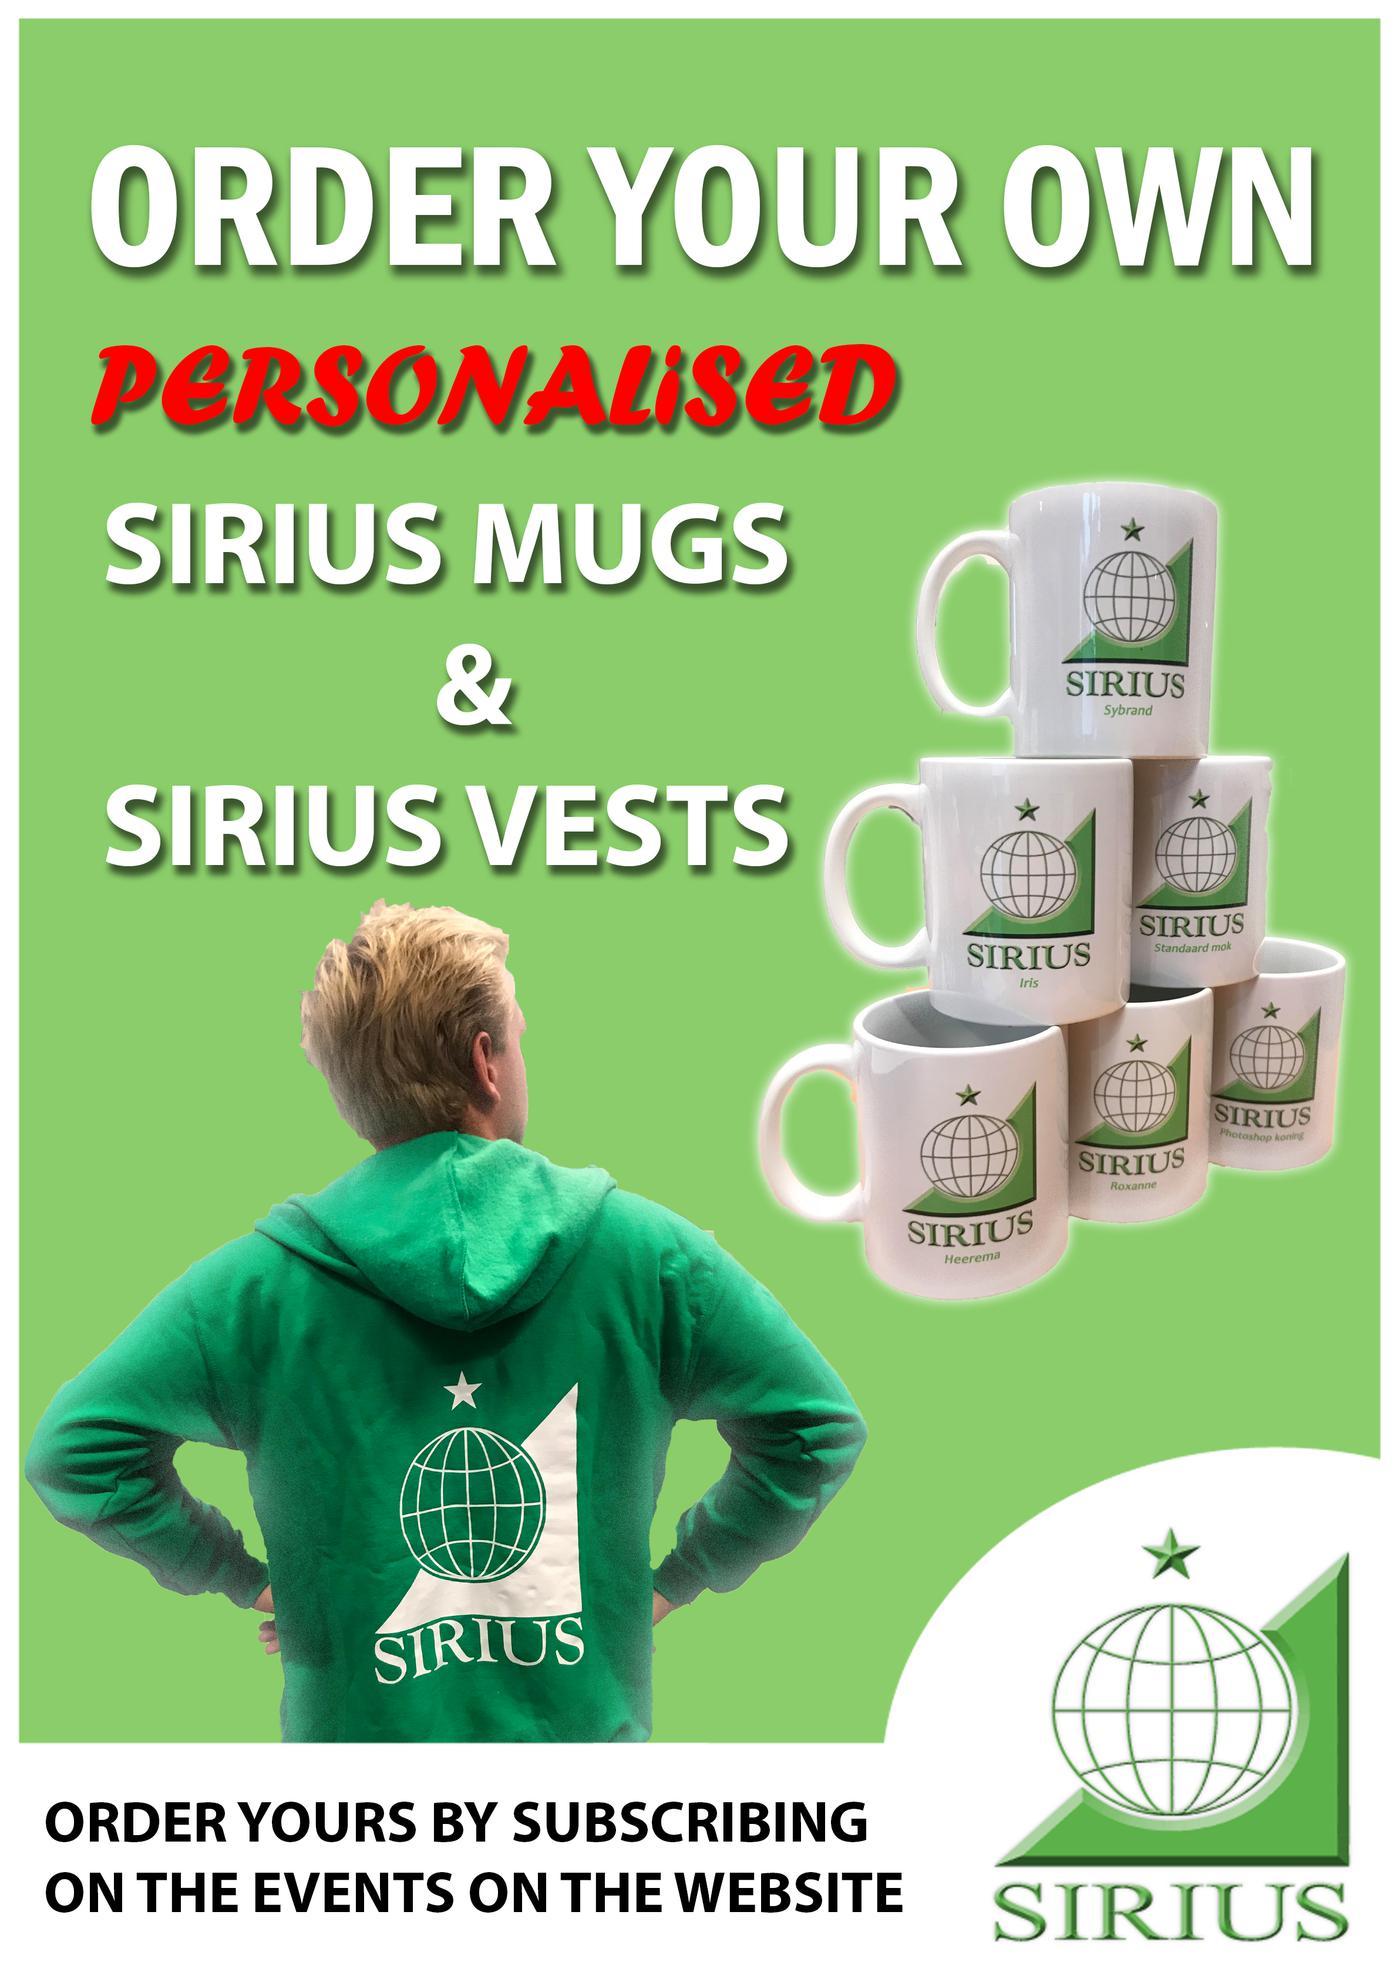 Sirius vests